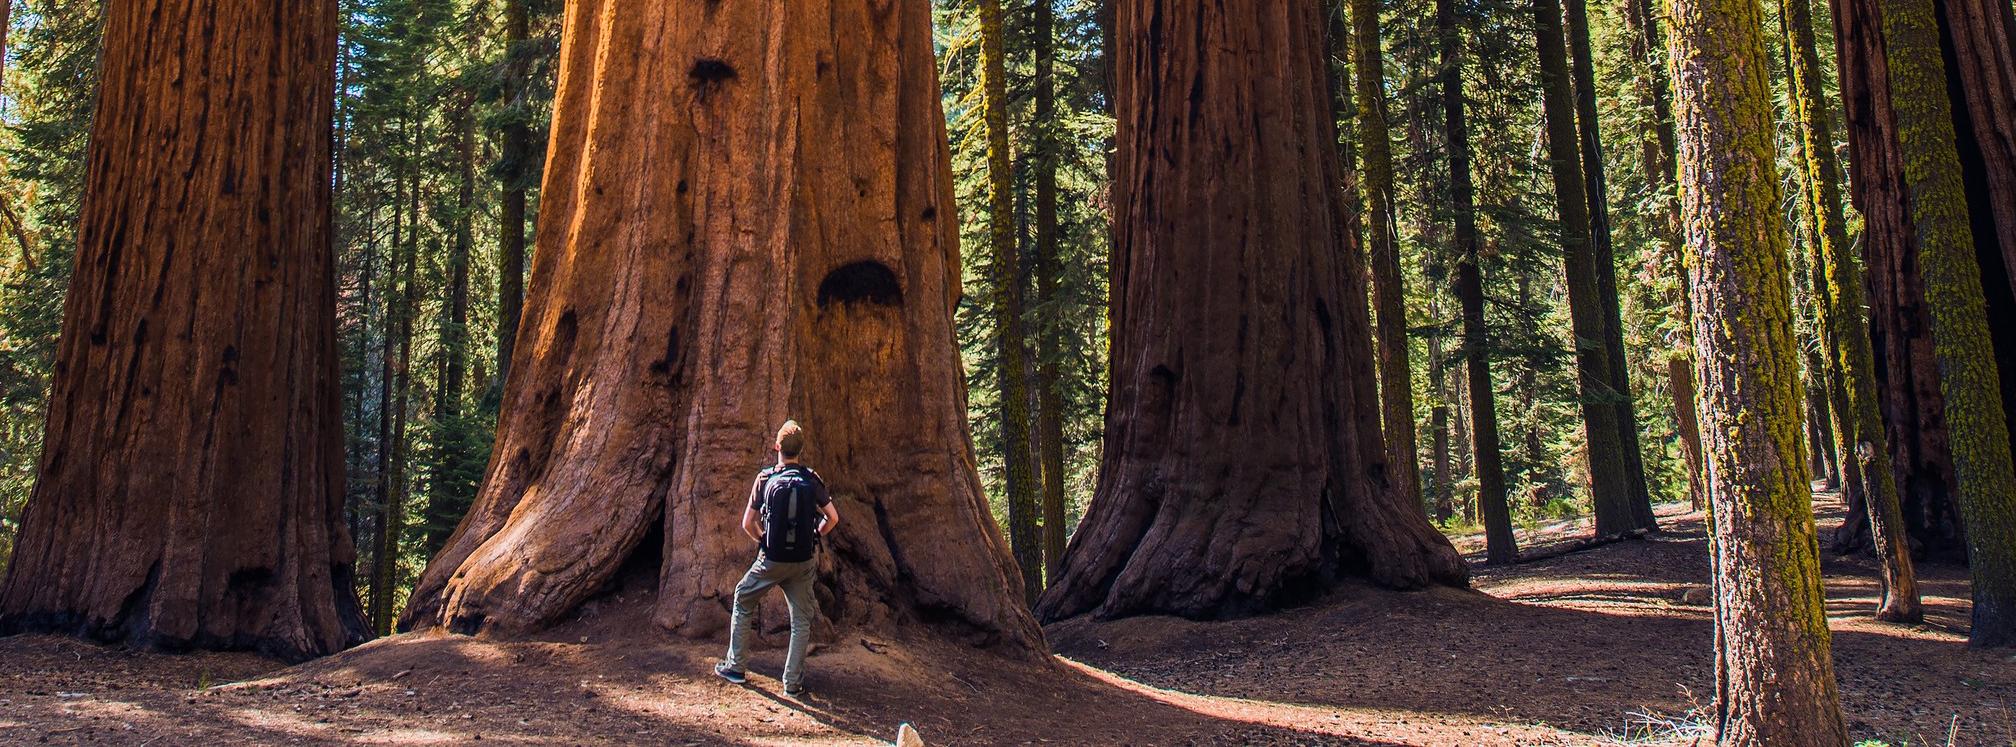 man vs tree cropped.jpg